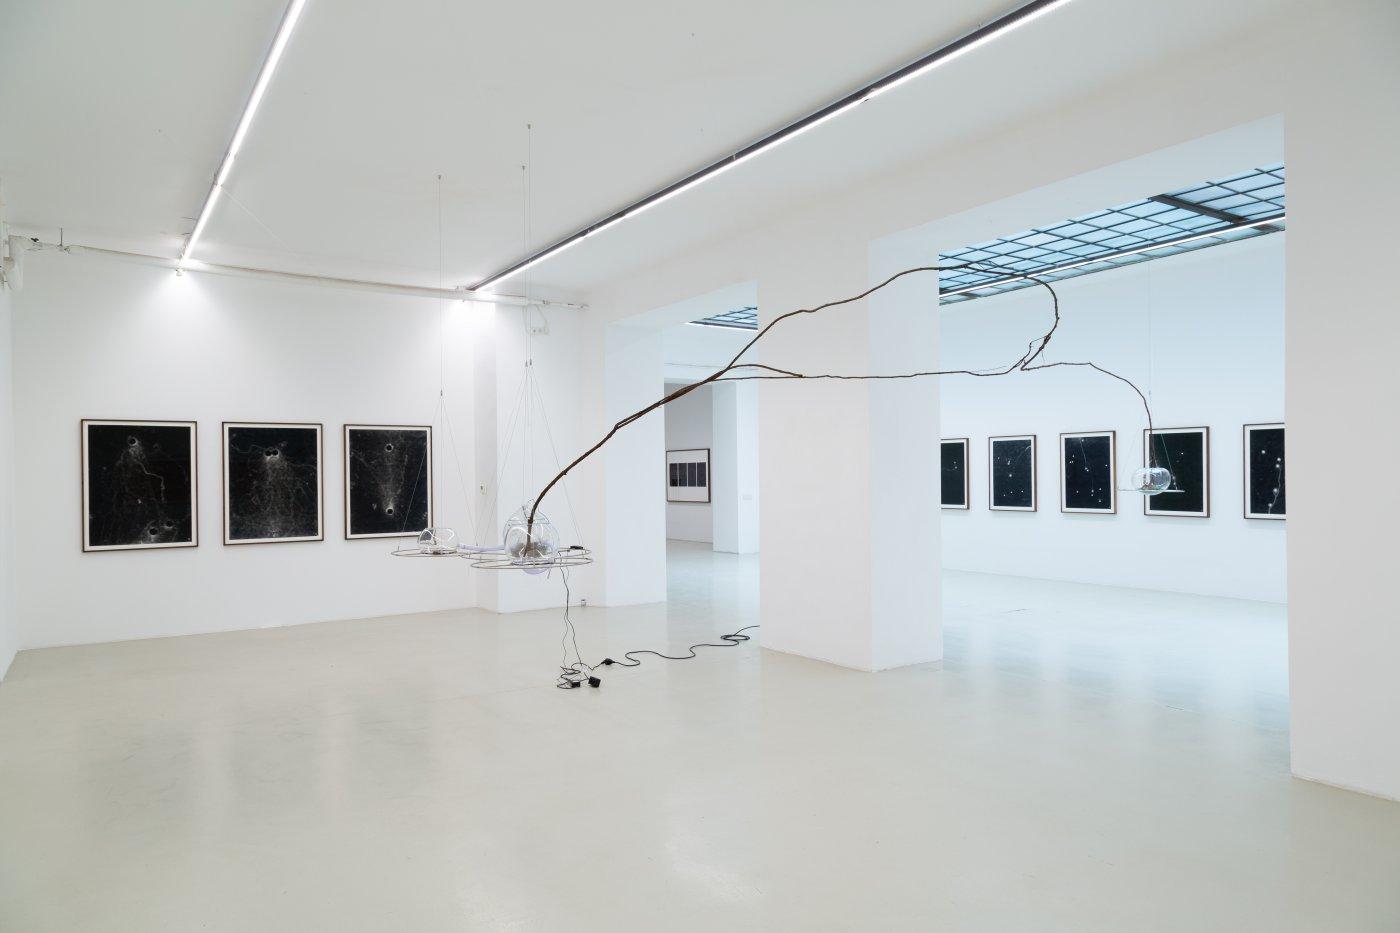 Galerie Kandlhofer Maximilian Prufer 7